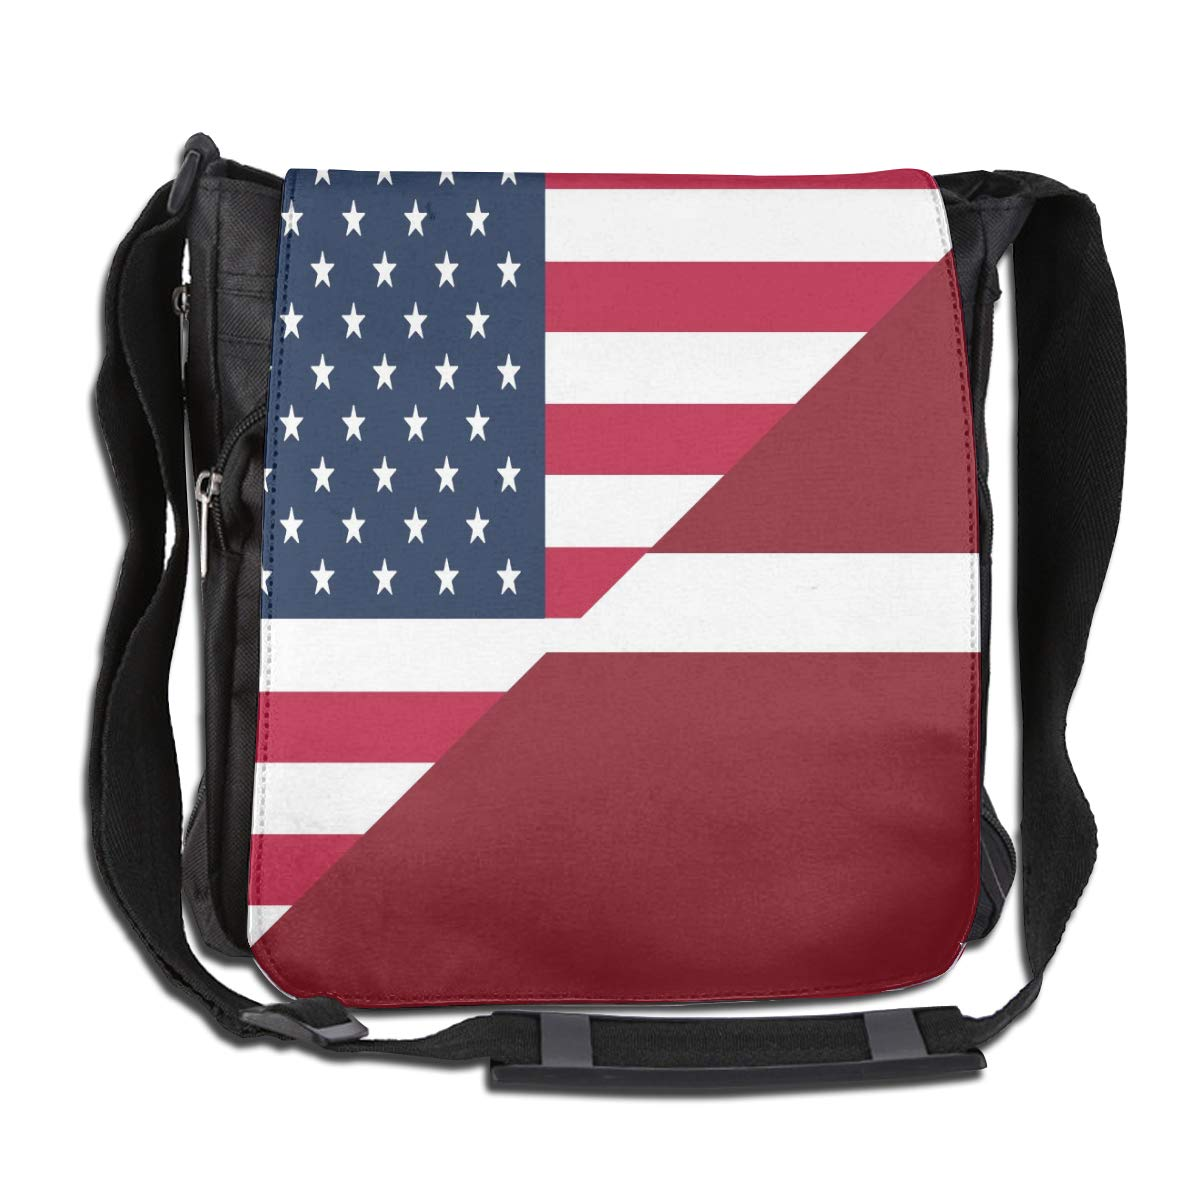 Unisex Stylish Satchel Messenger Bags American And Latvia Flag Crossbody Shoulder Bag Traveling Bag For School//Work//Trips